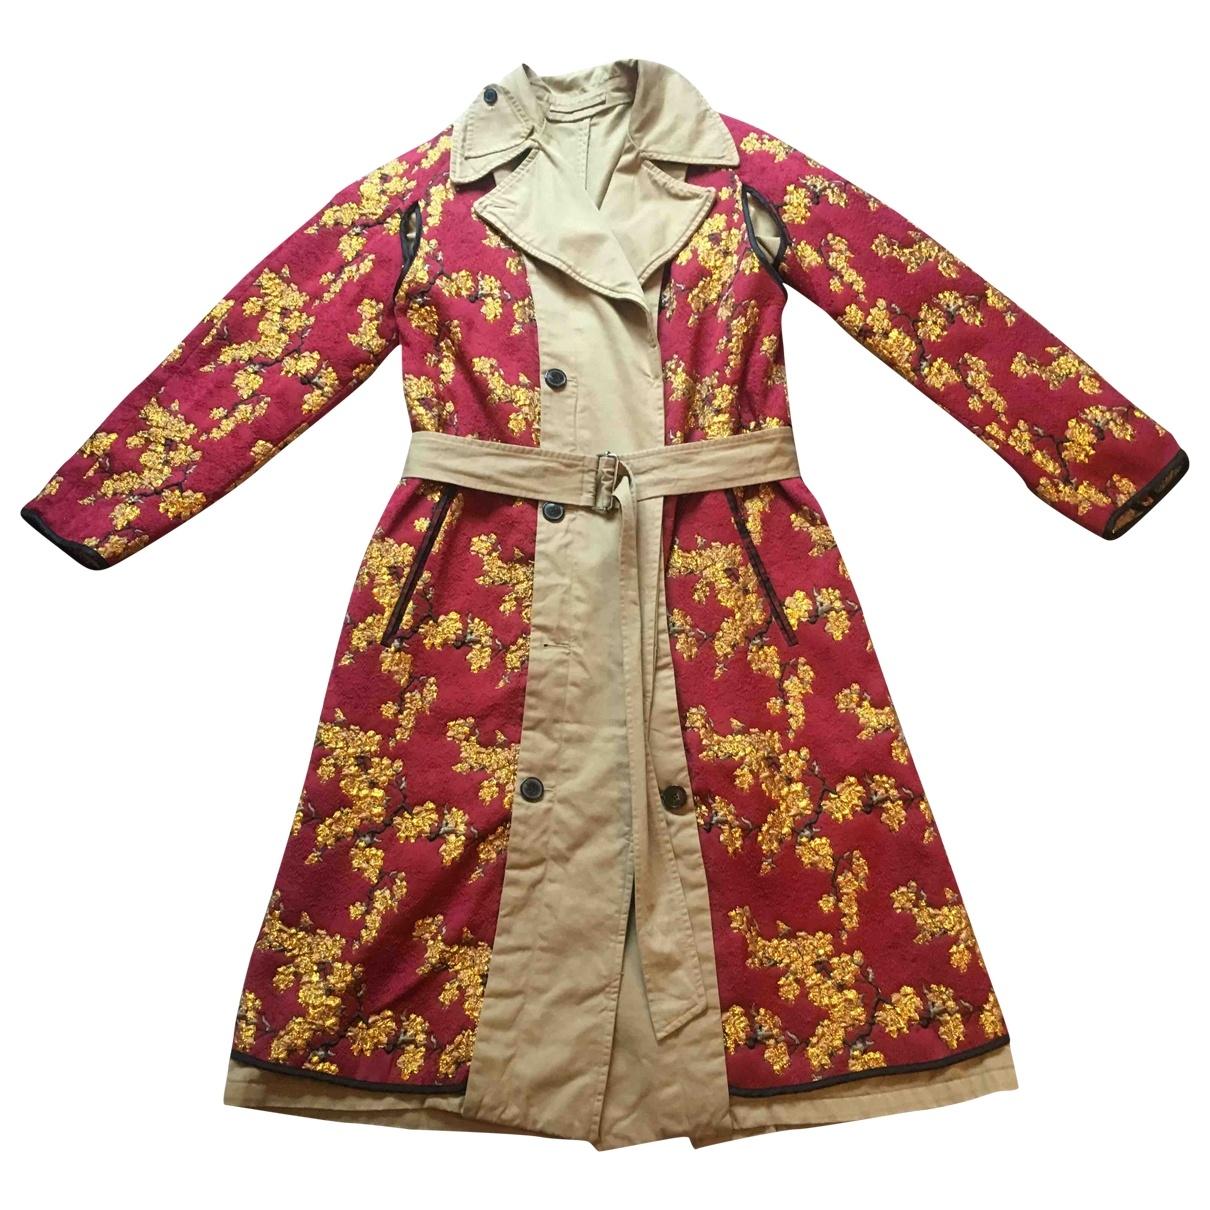 Dries Van Noten \N Multicolour Cotton coat for Women S International